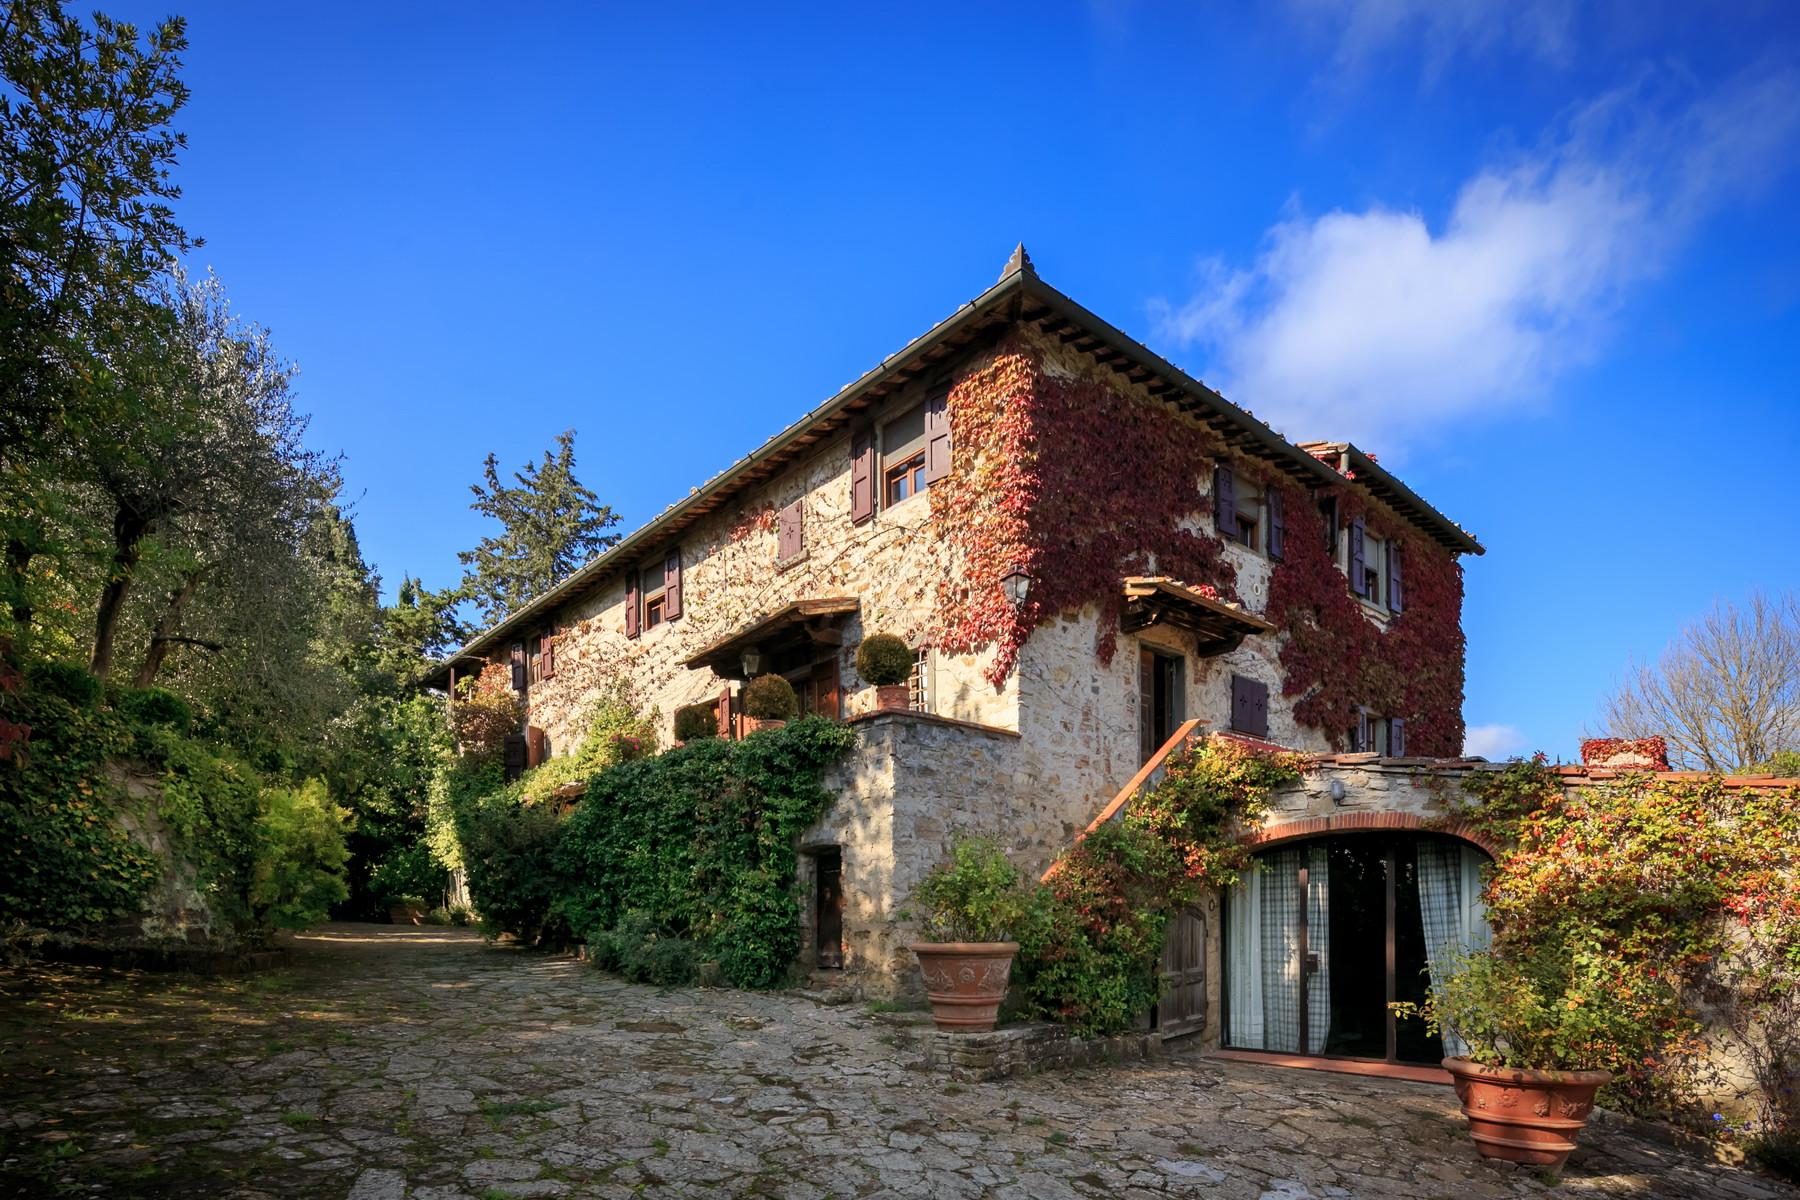 Rustico in Vendita a Castellina In Chianti: 5 locali, 720 mq - Foto 12